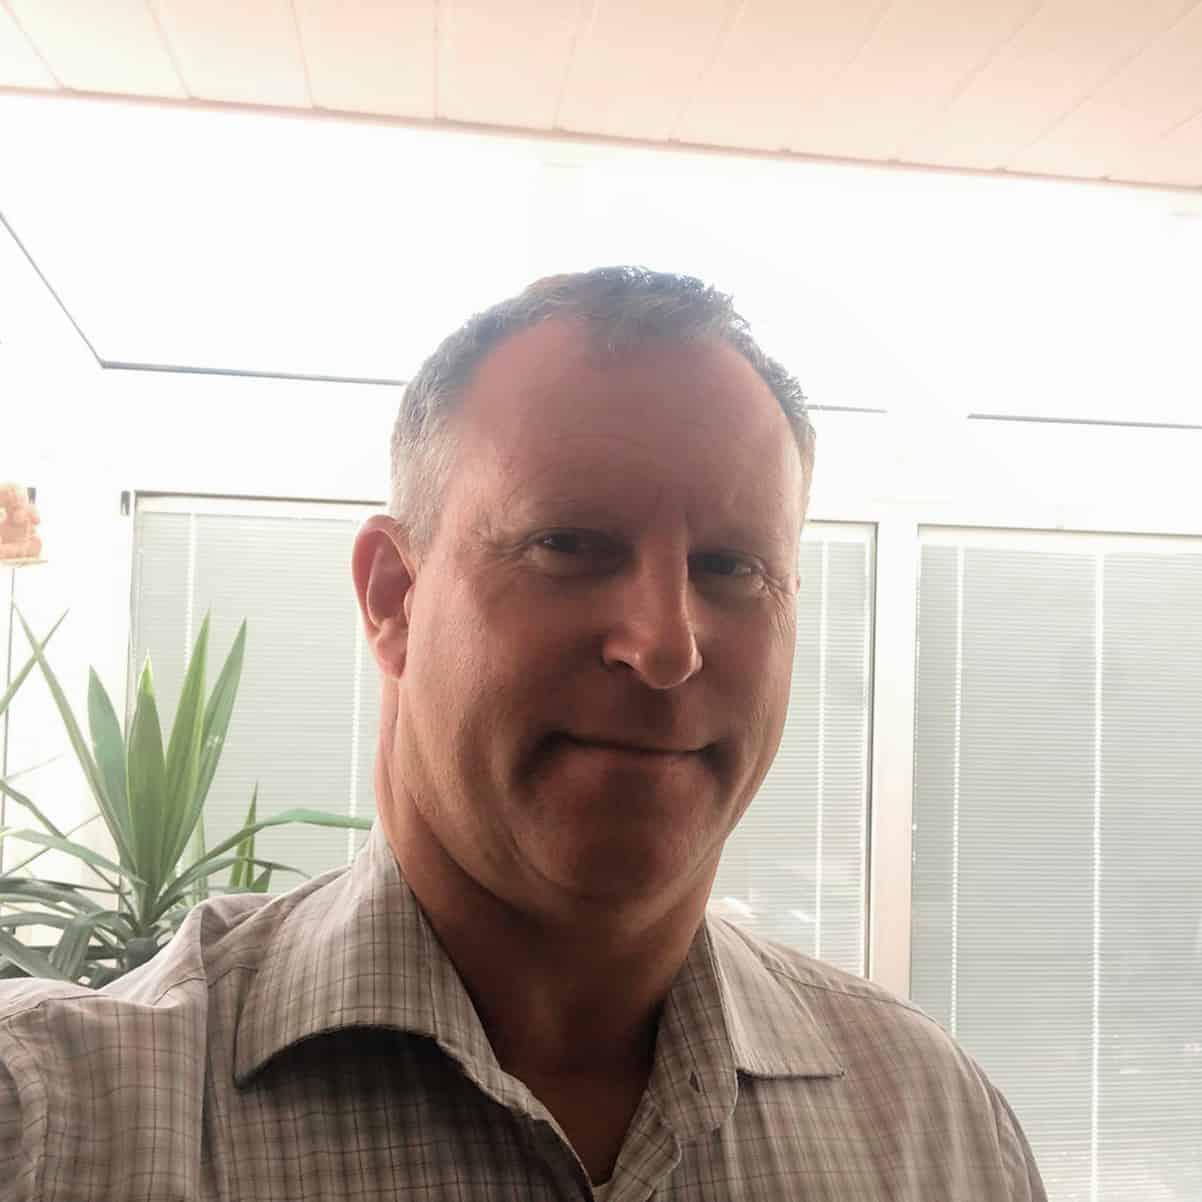 Andreas Kiehl